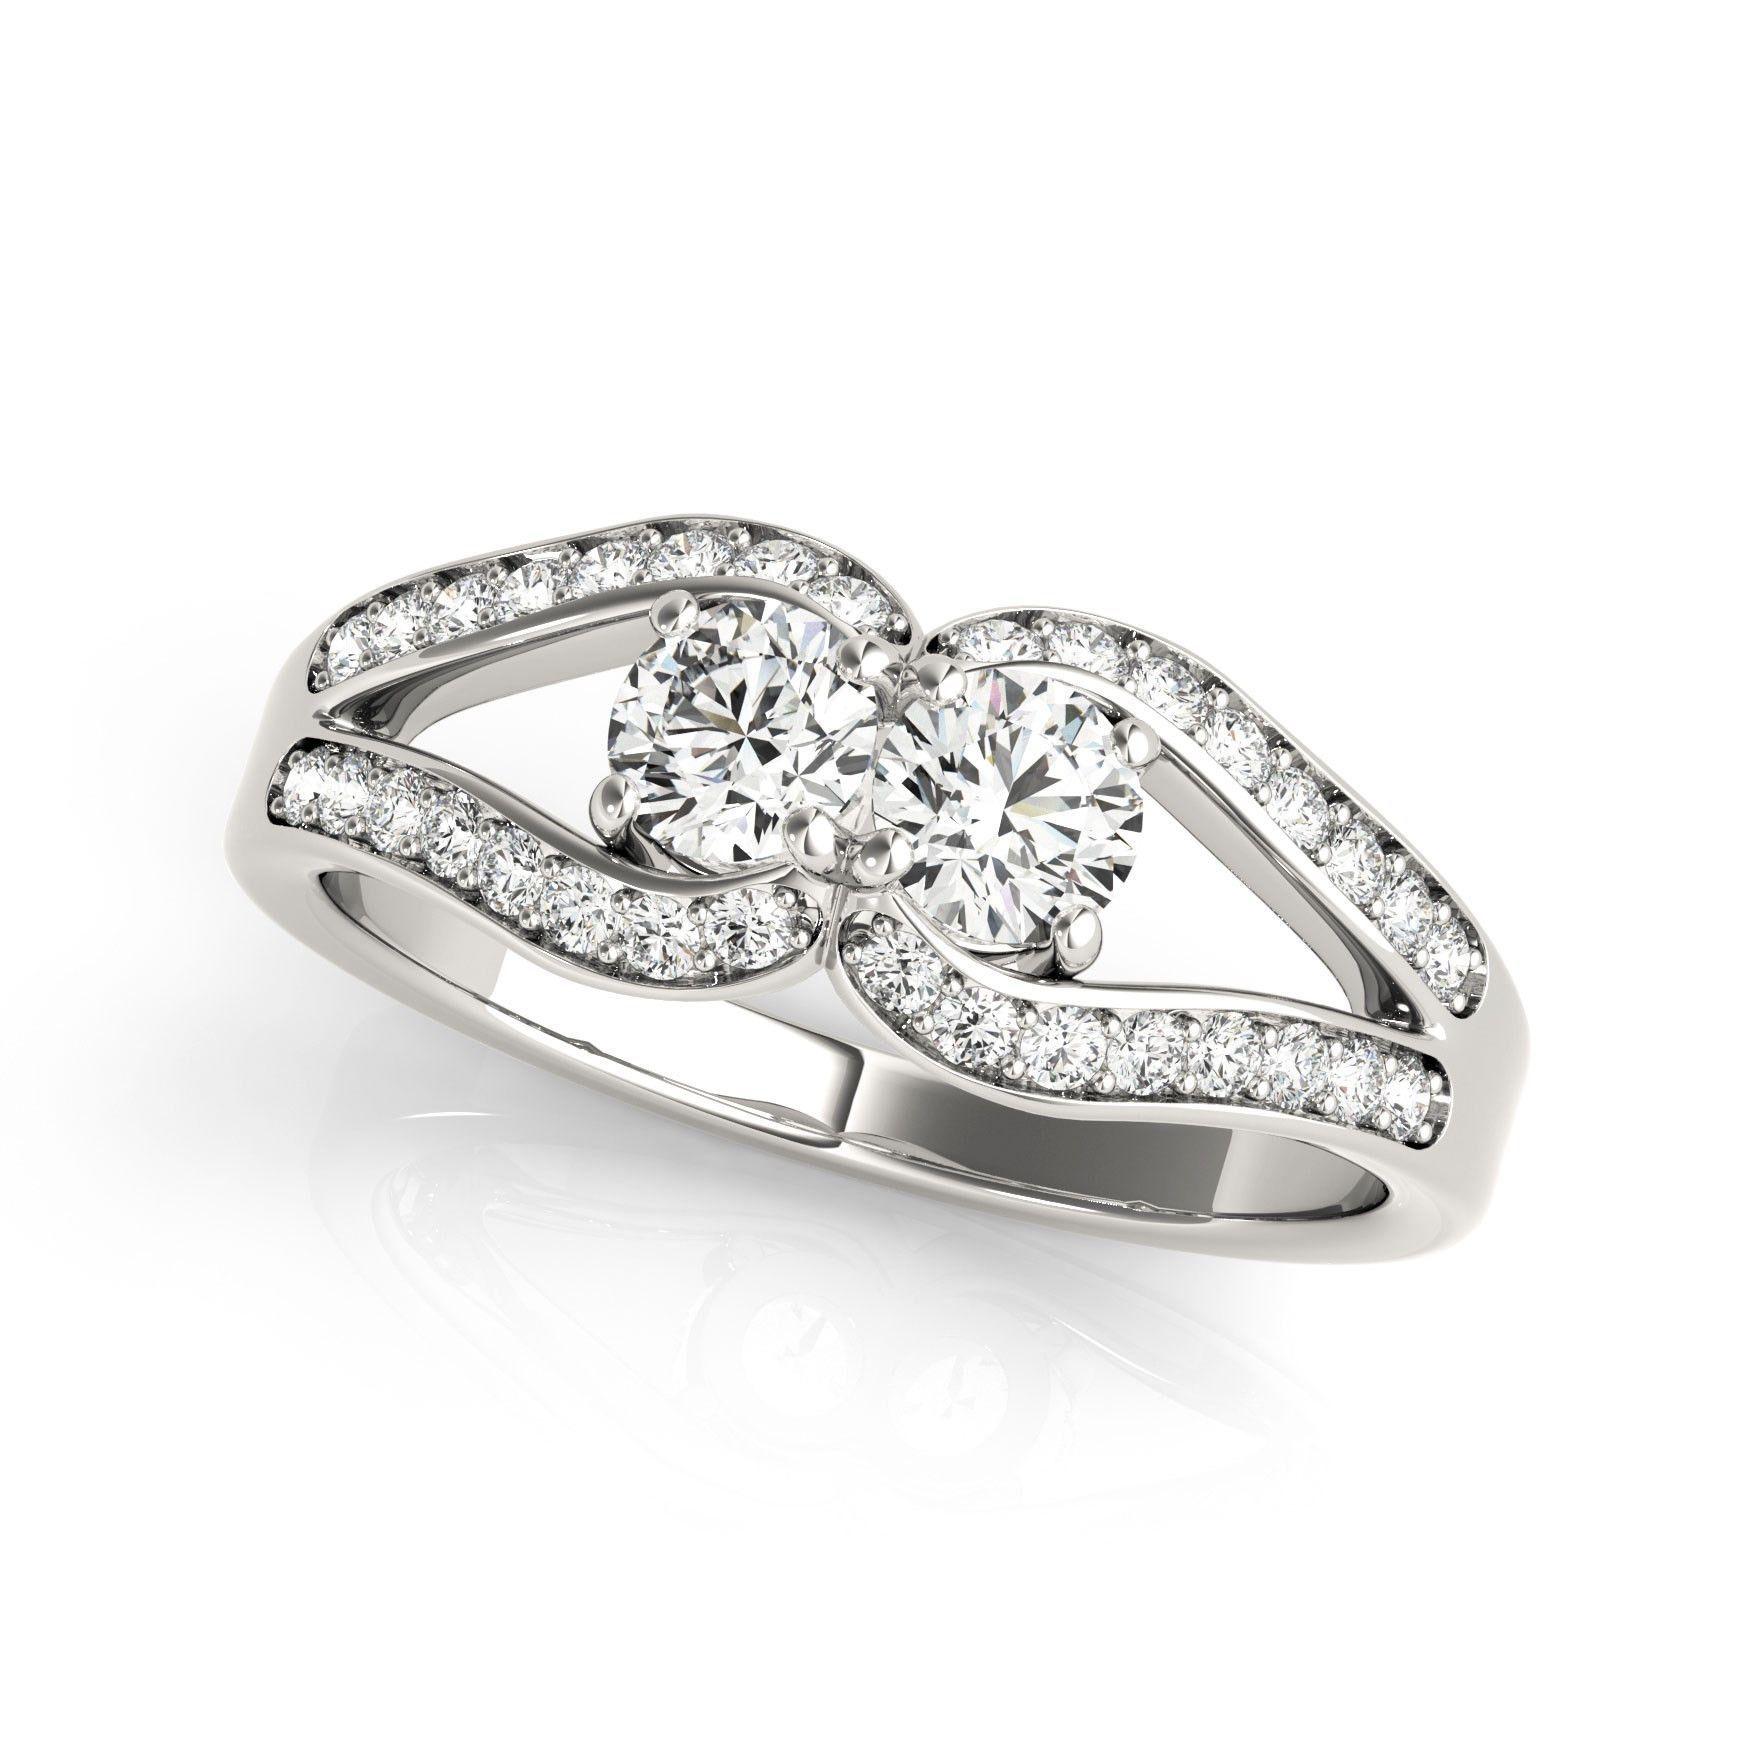 Two Stone Split Shank Design Diamond Ring in 14K White